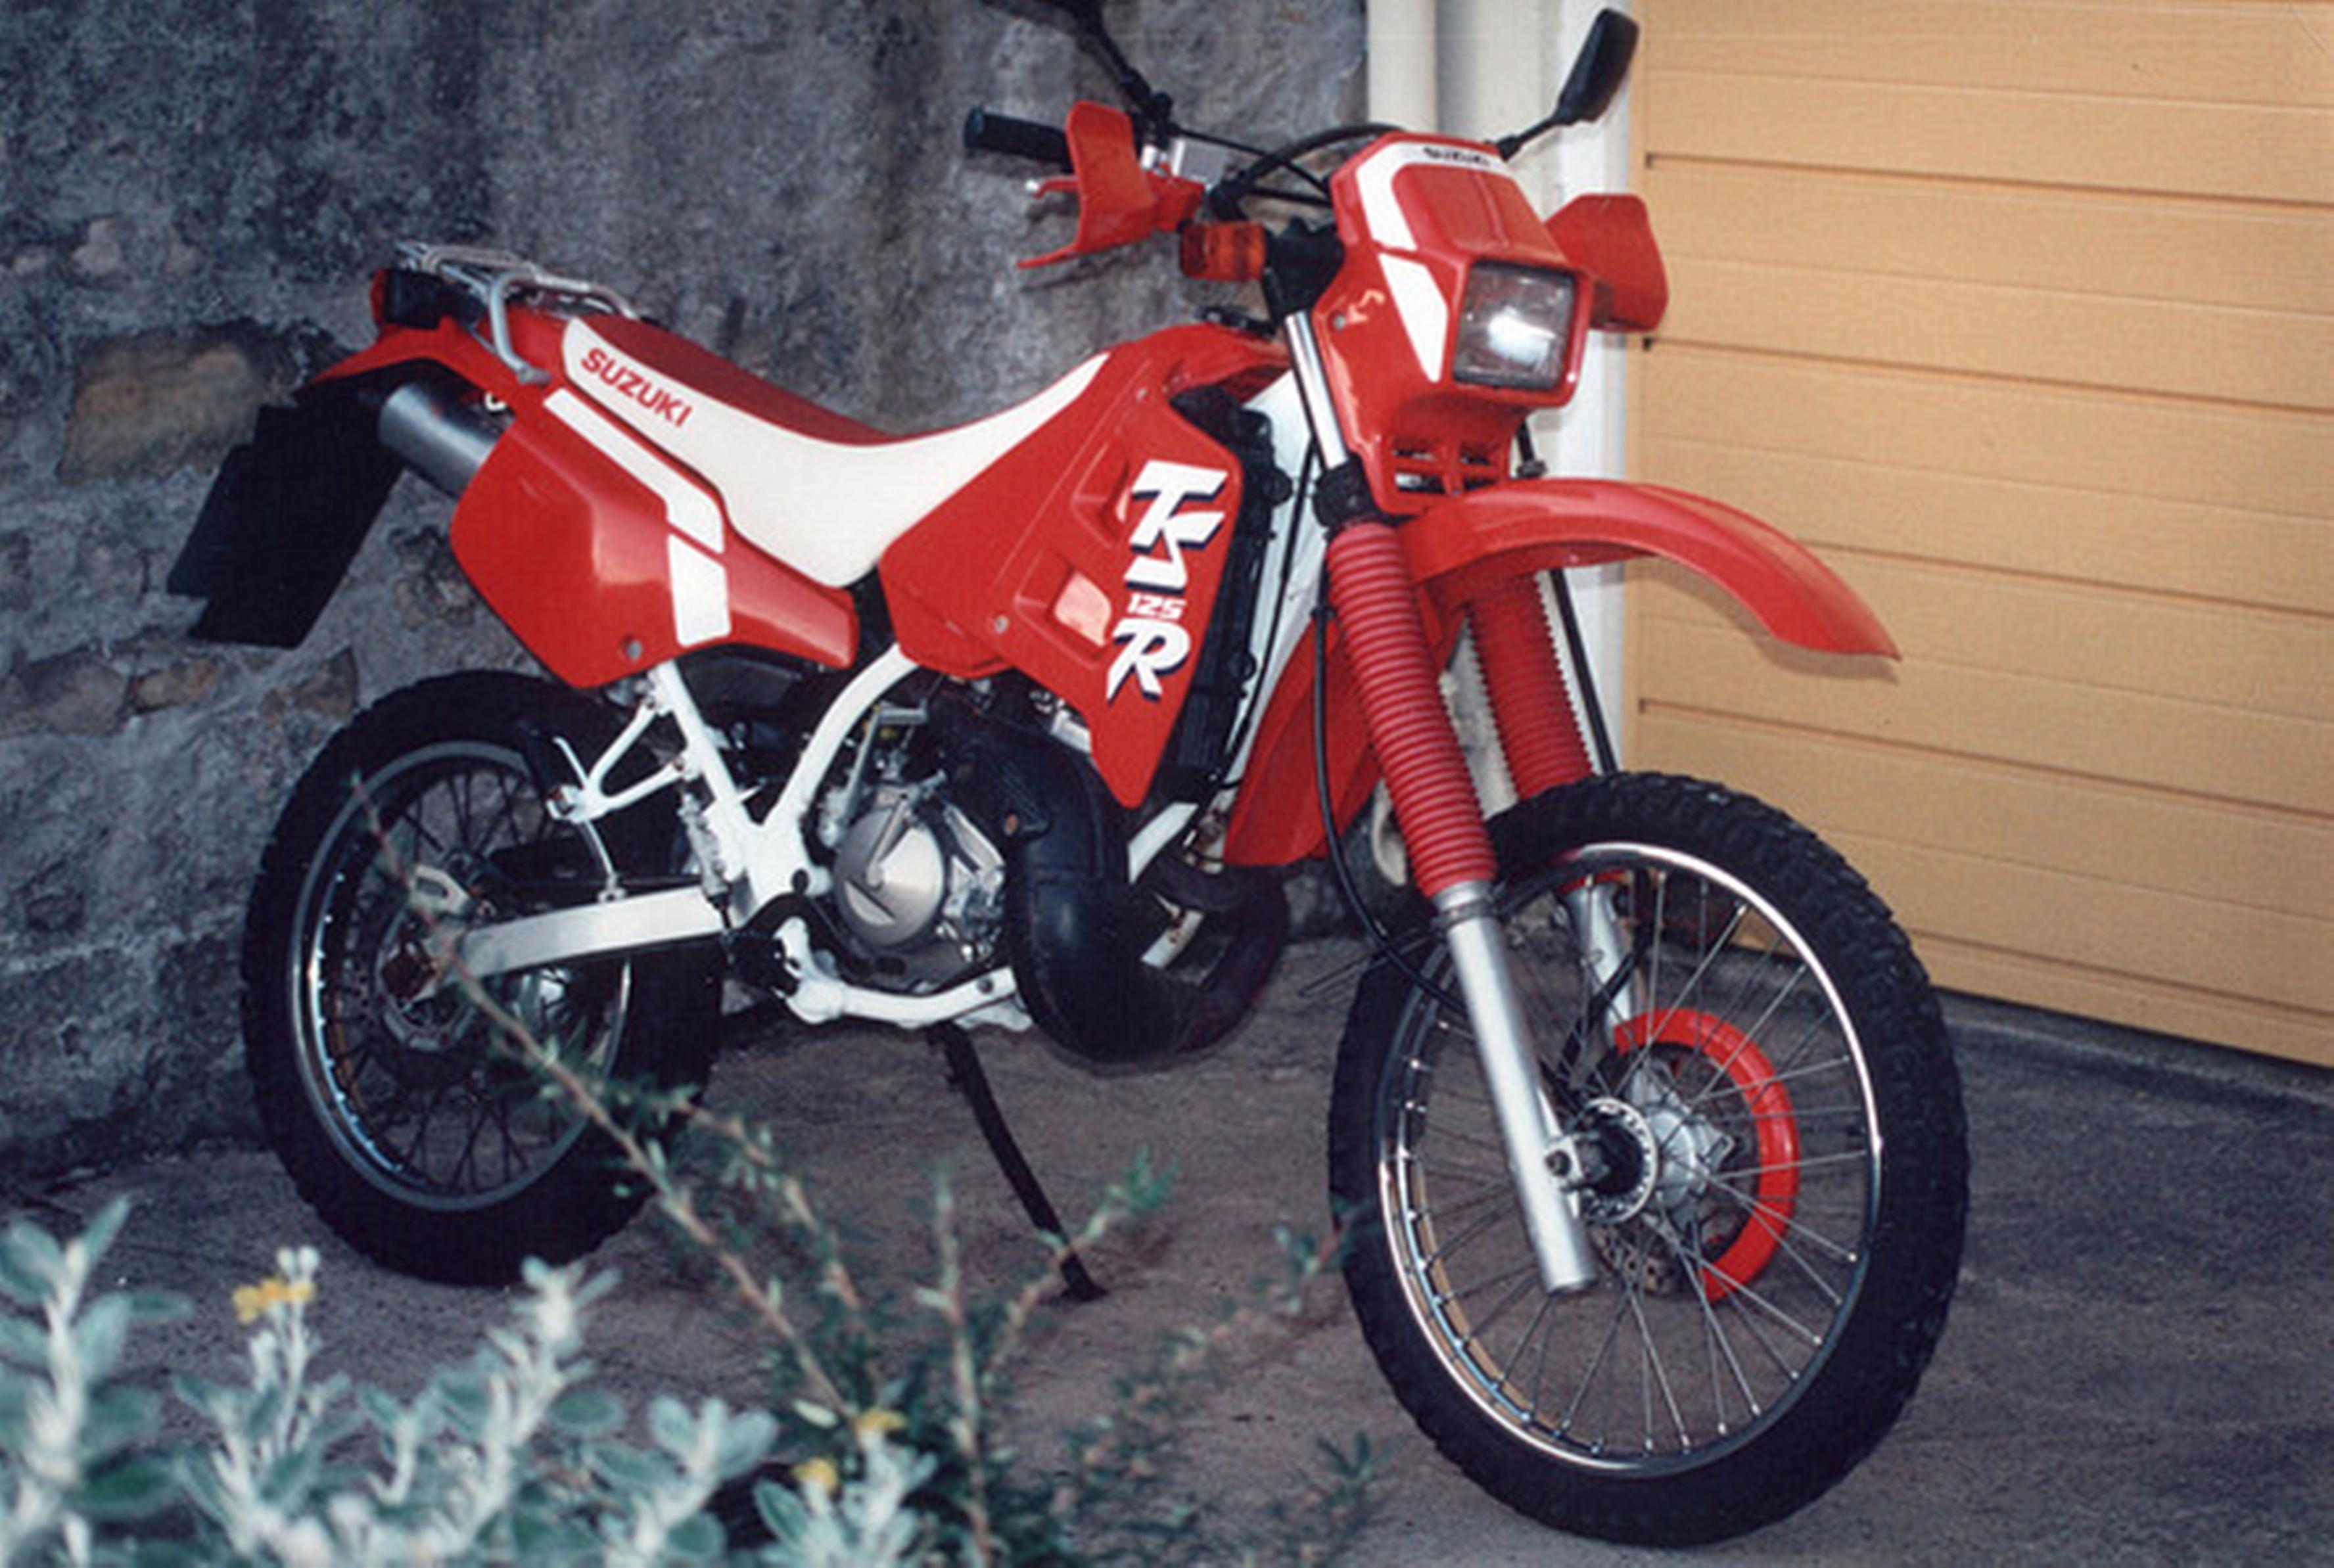 File:Suzuki TS 125 R 1991 jpg - Wikimedia Commons